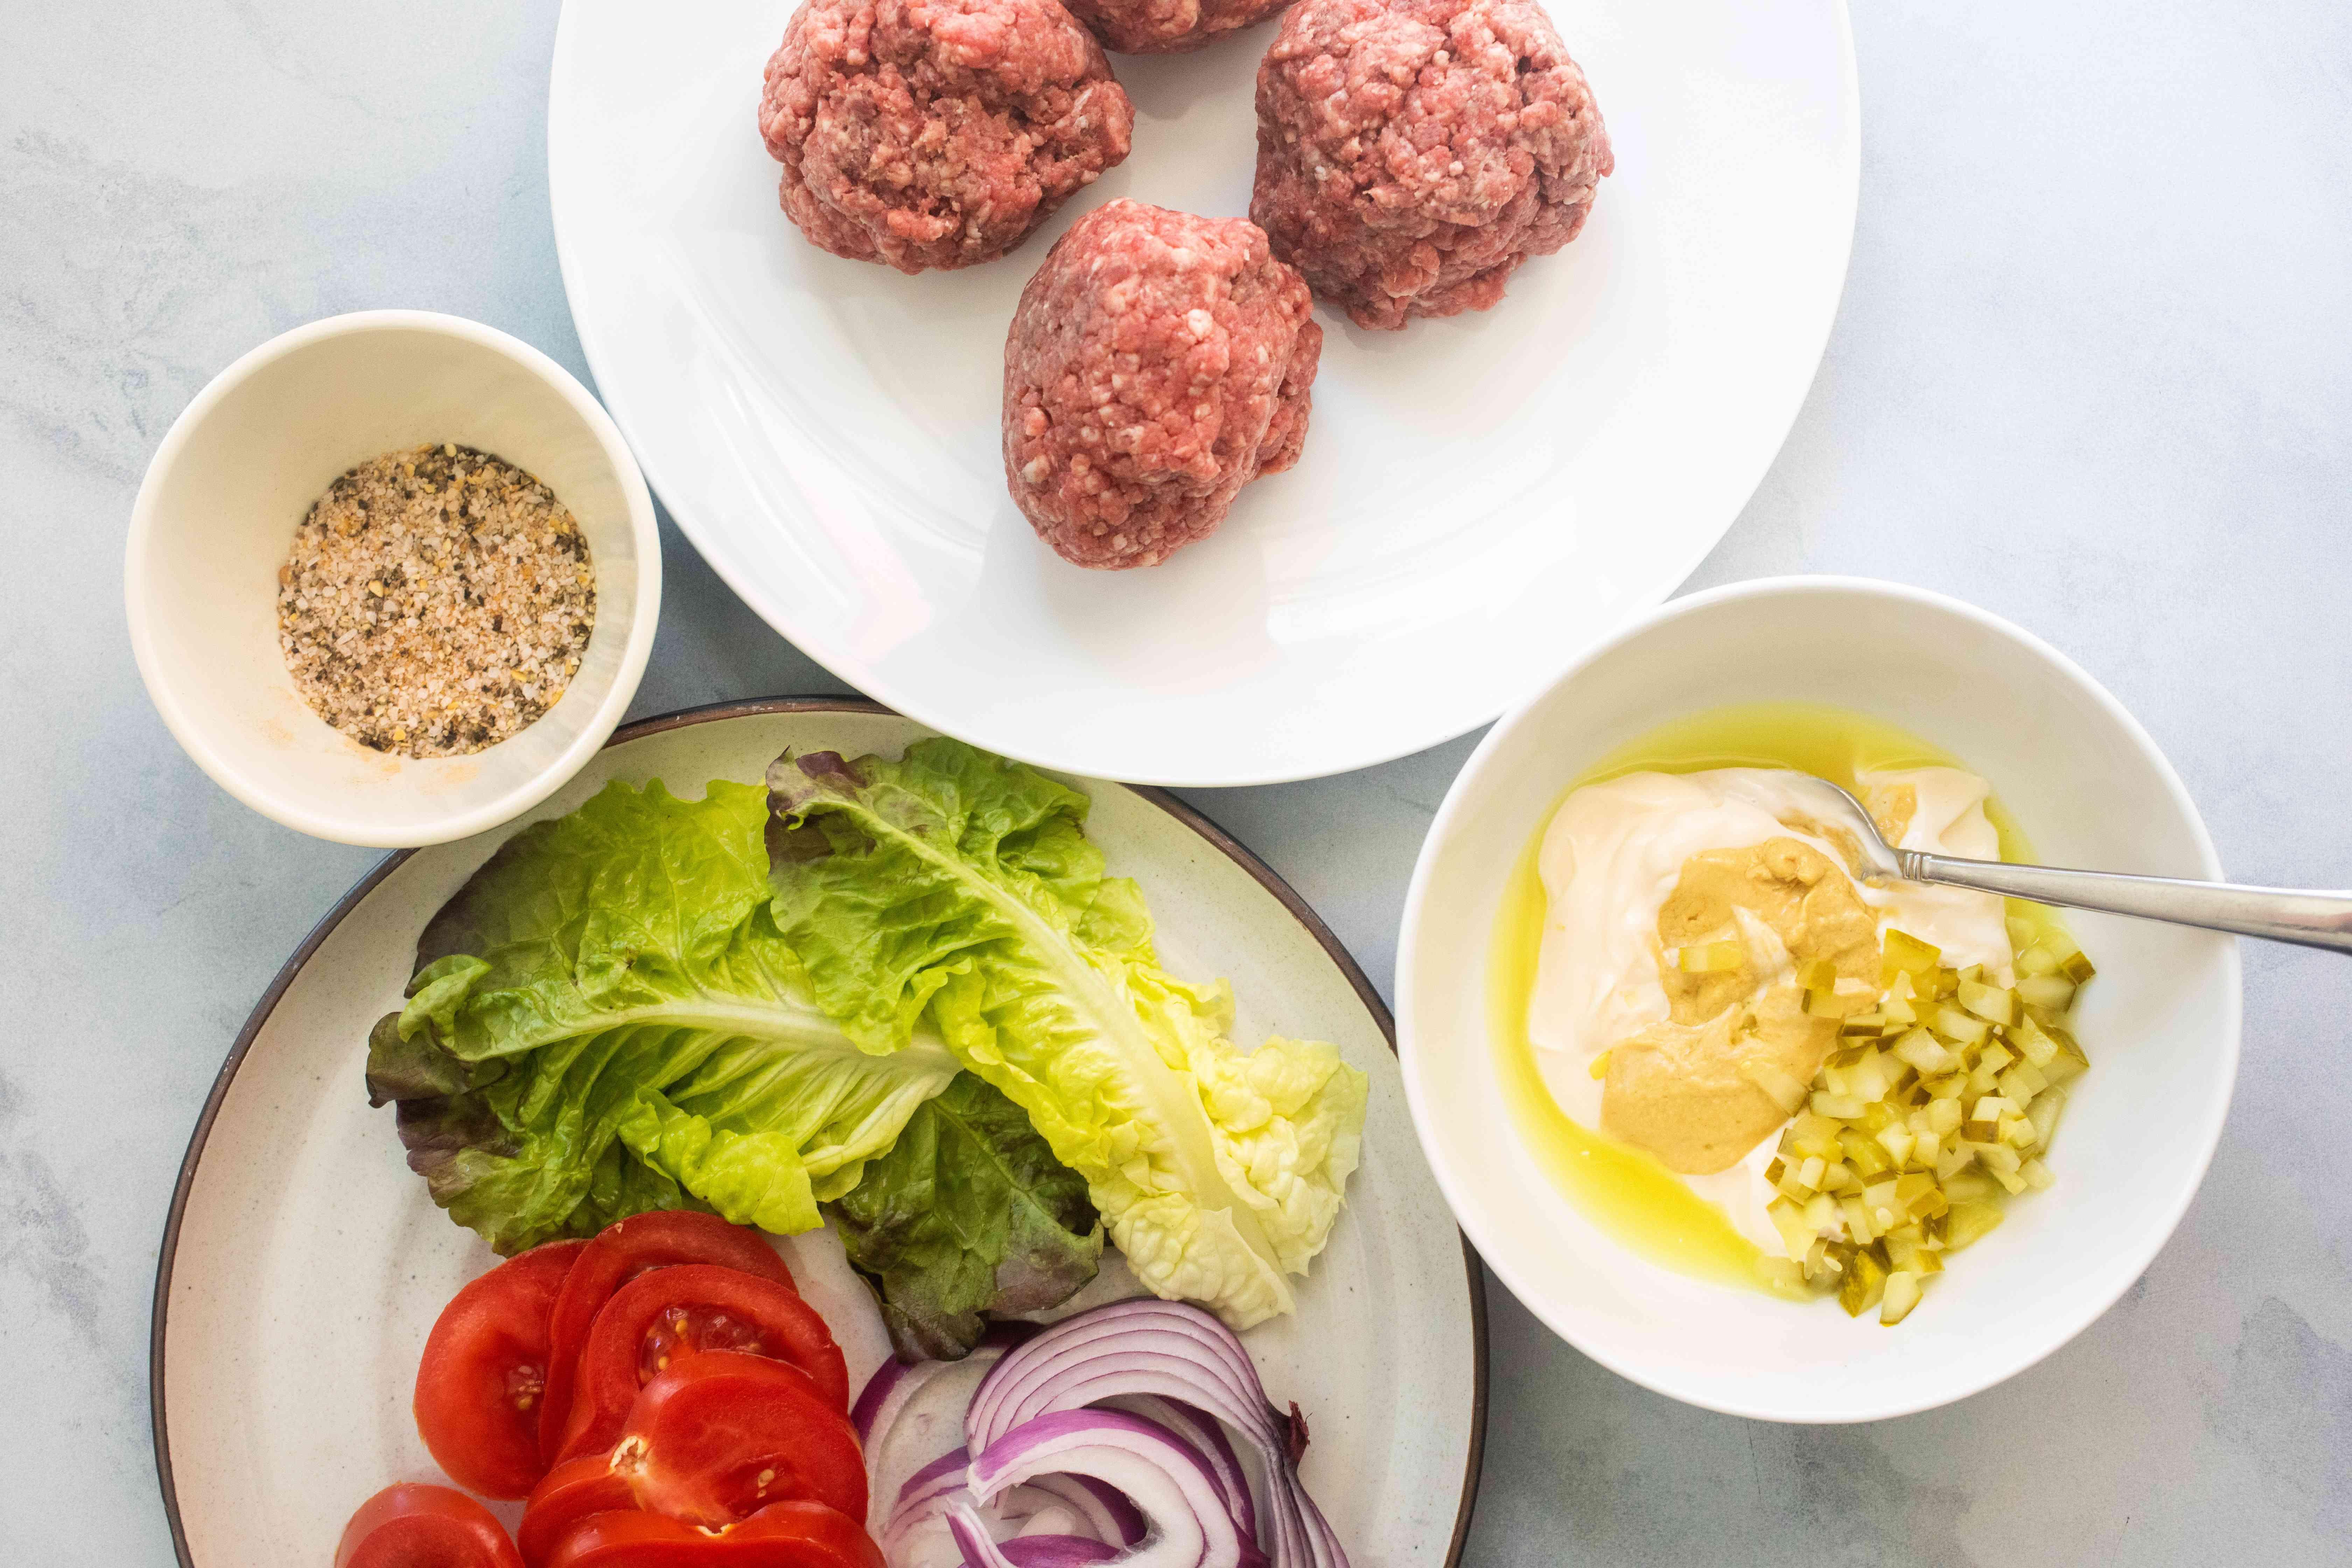 Ingredients to make a smashburger-style burger recipe.